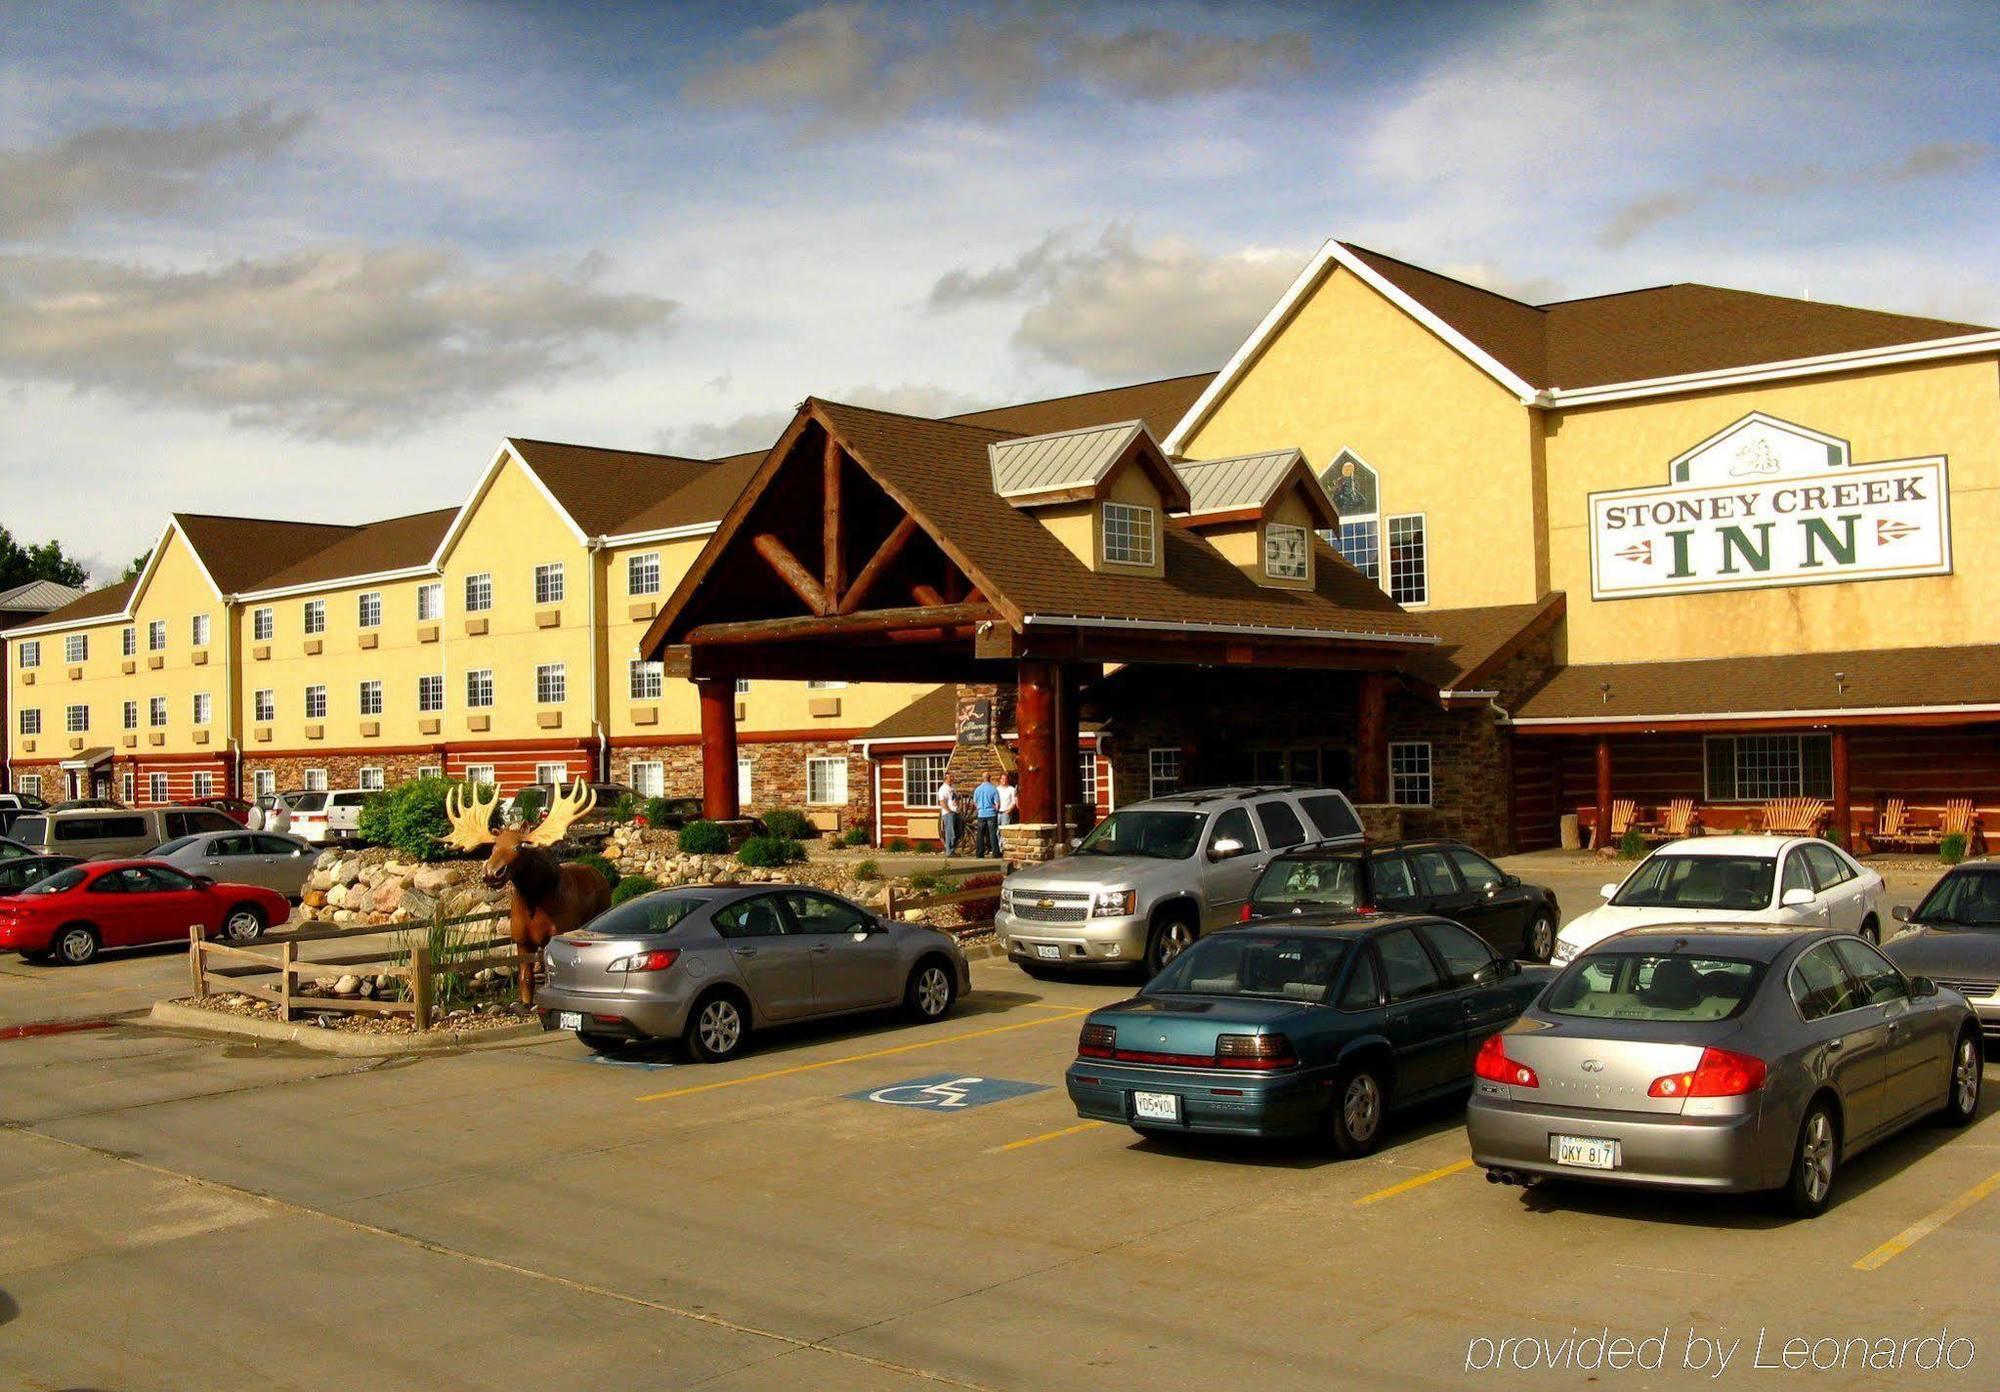 STONEY CREEK HOTEL & CONFERENCE CENTER - ST. JOSEPH, SAINT JOSEPH **